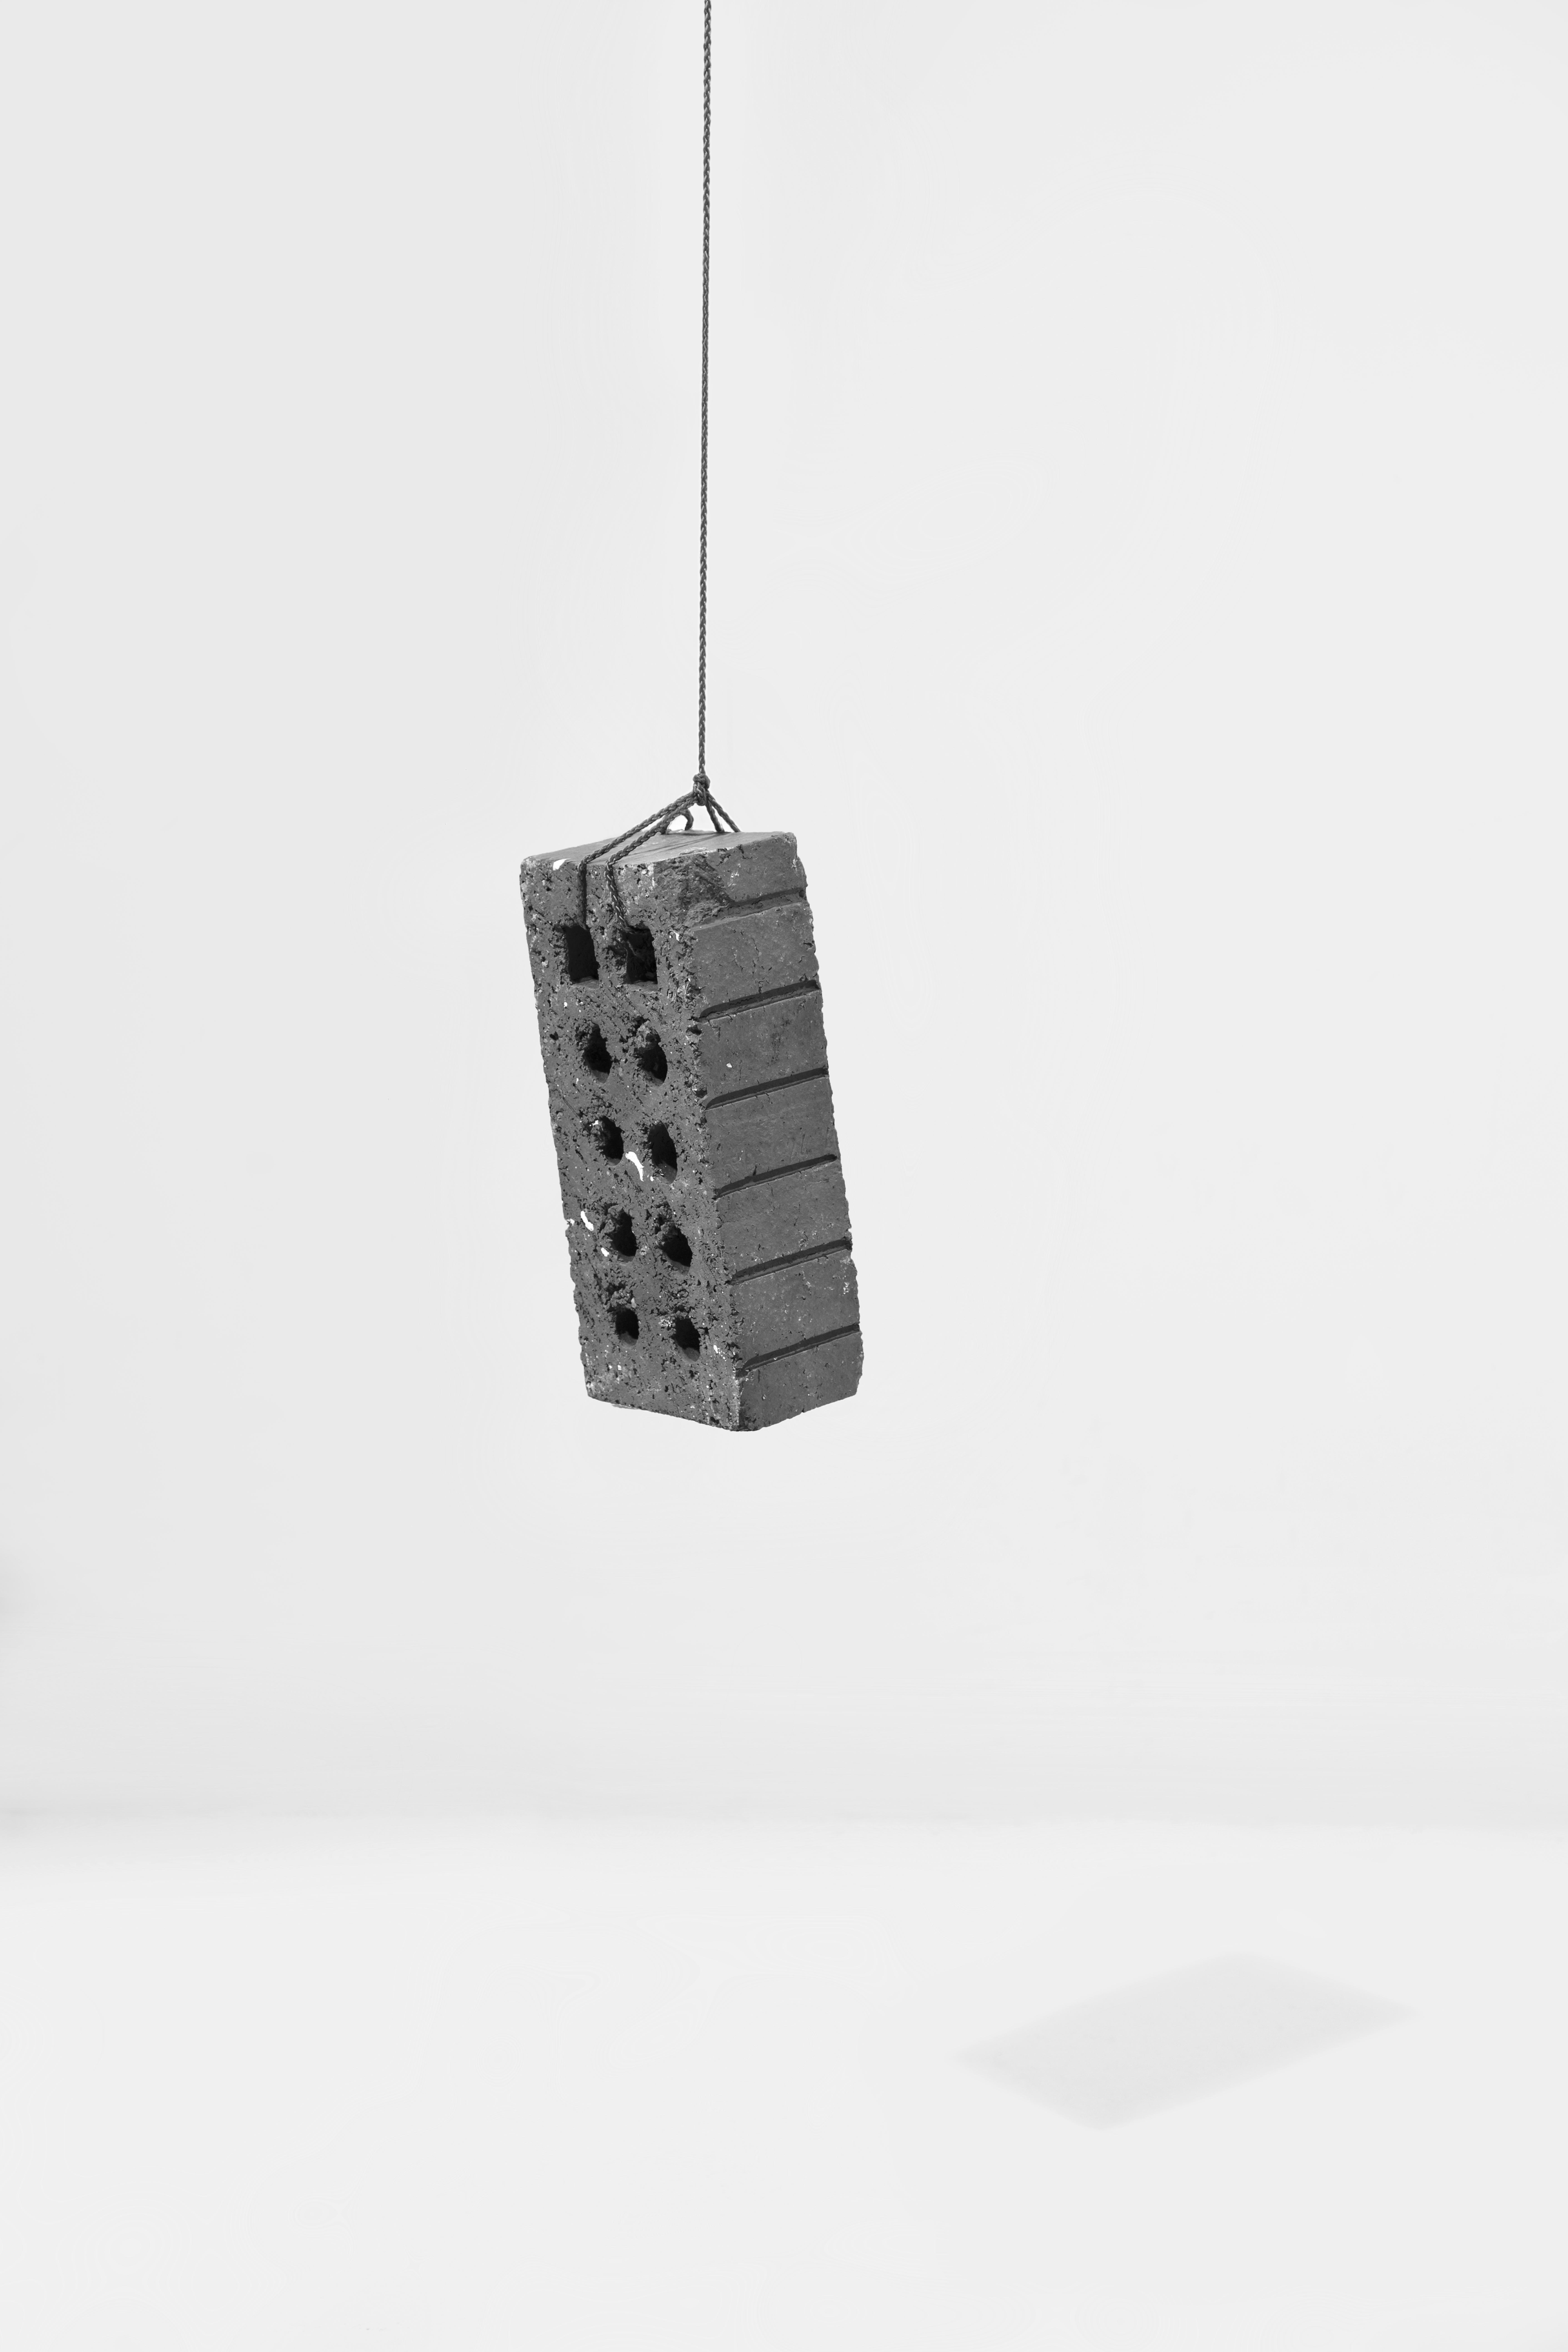 Untitled (Brick Suspended) (1).jpg